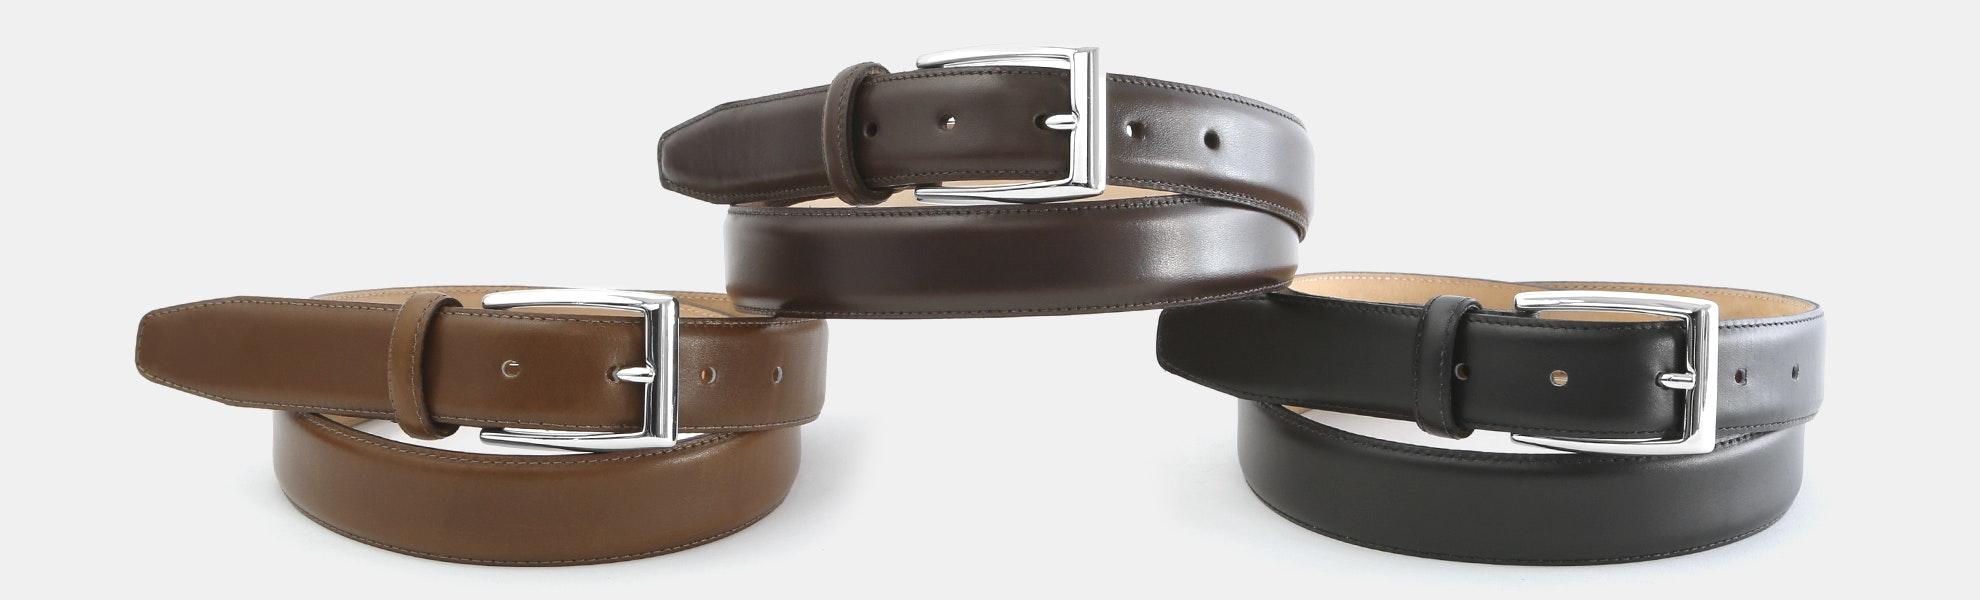 Massdrop x The British Belt Co. Dress Belt